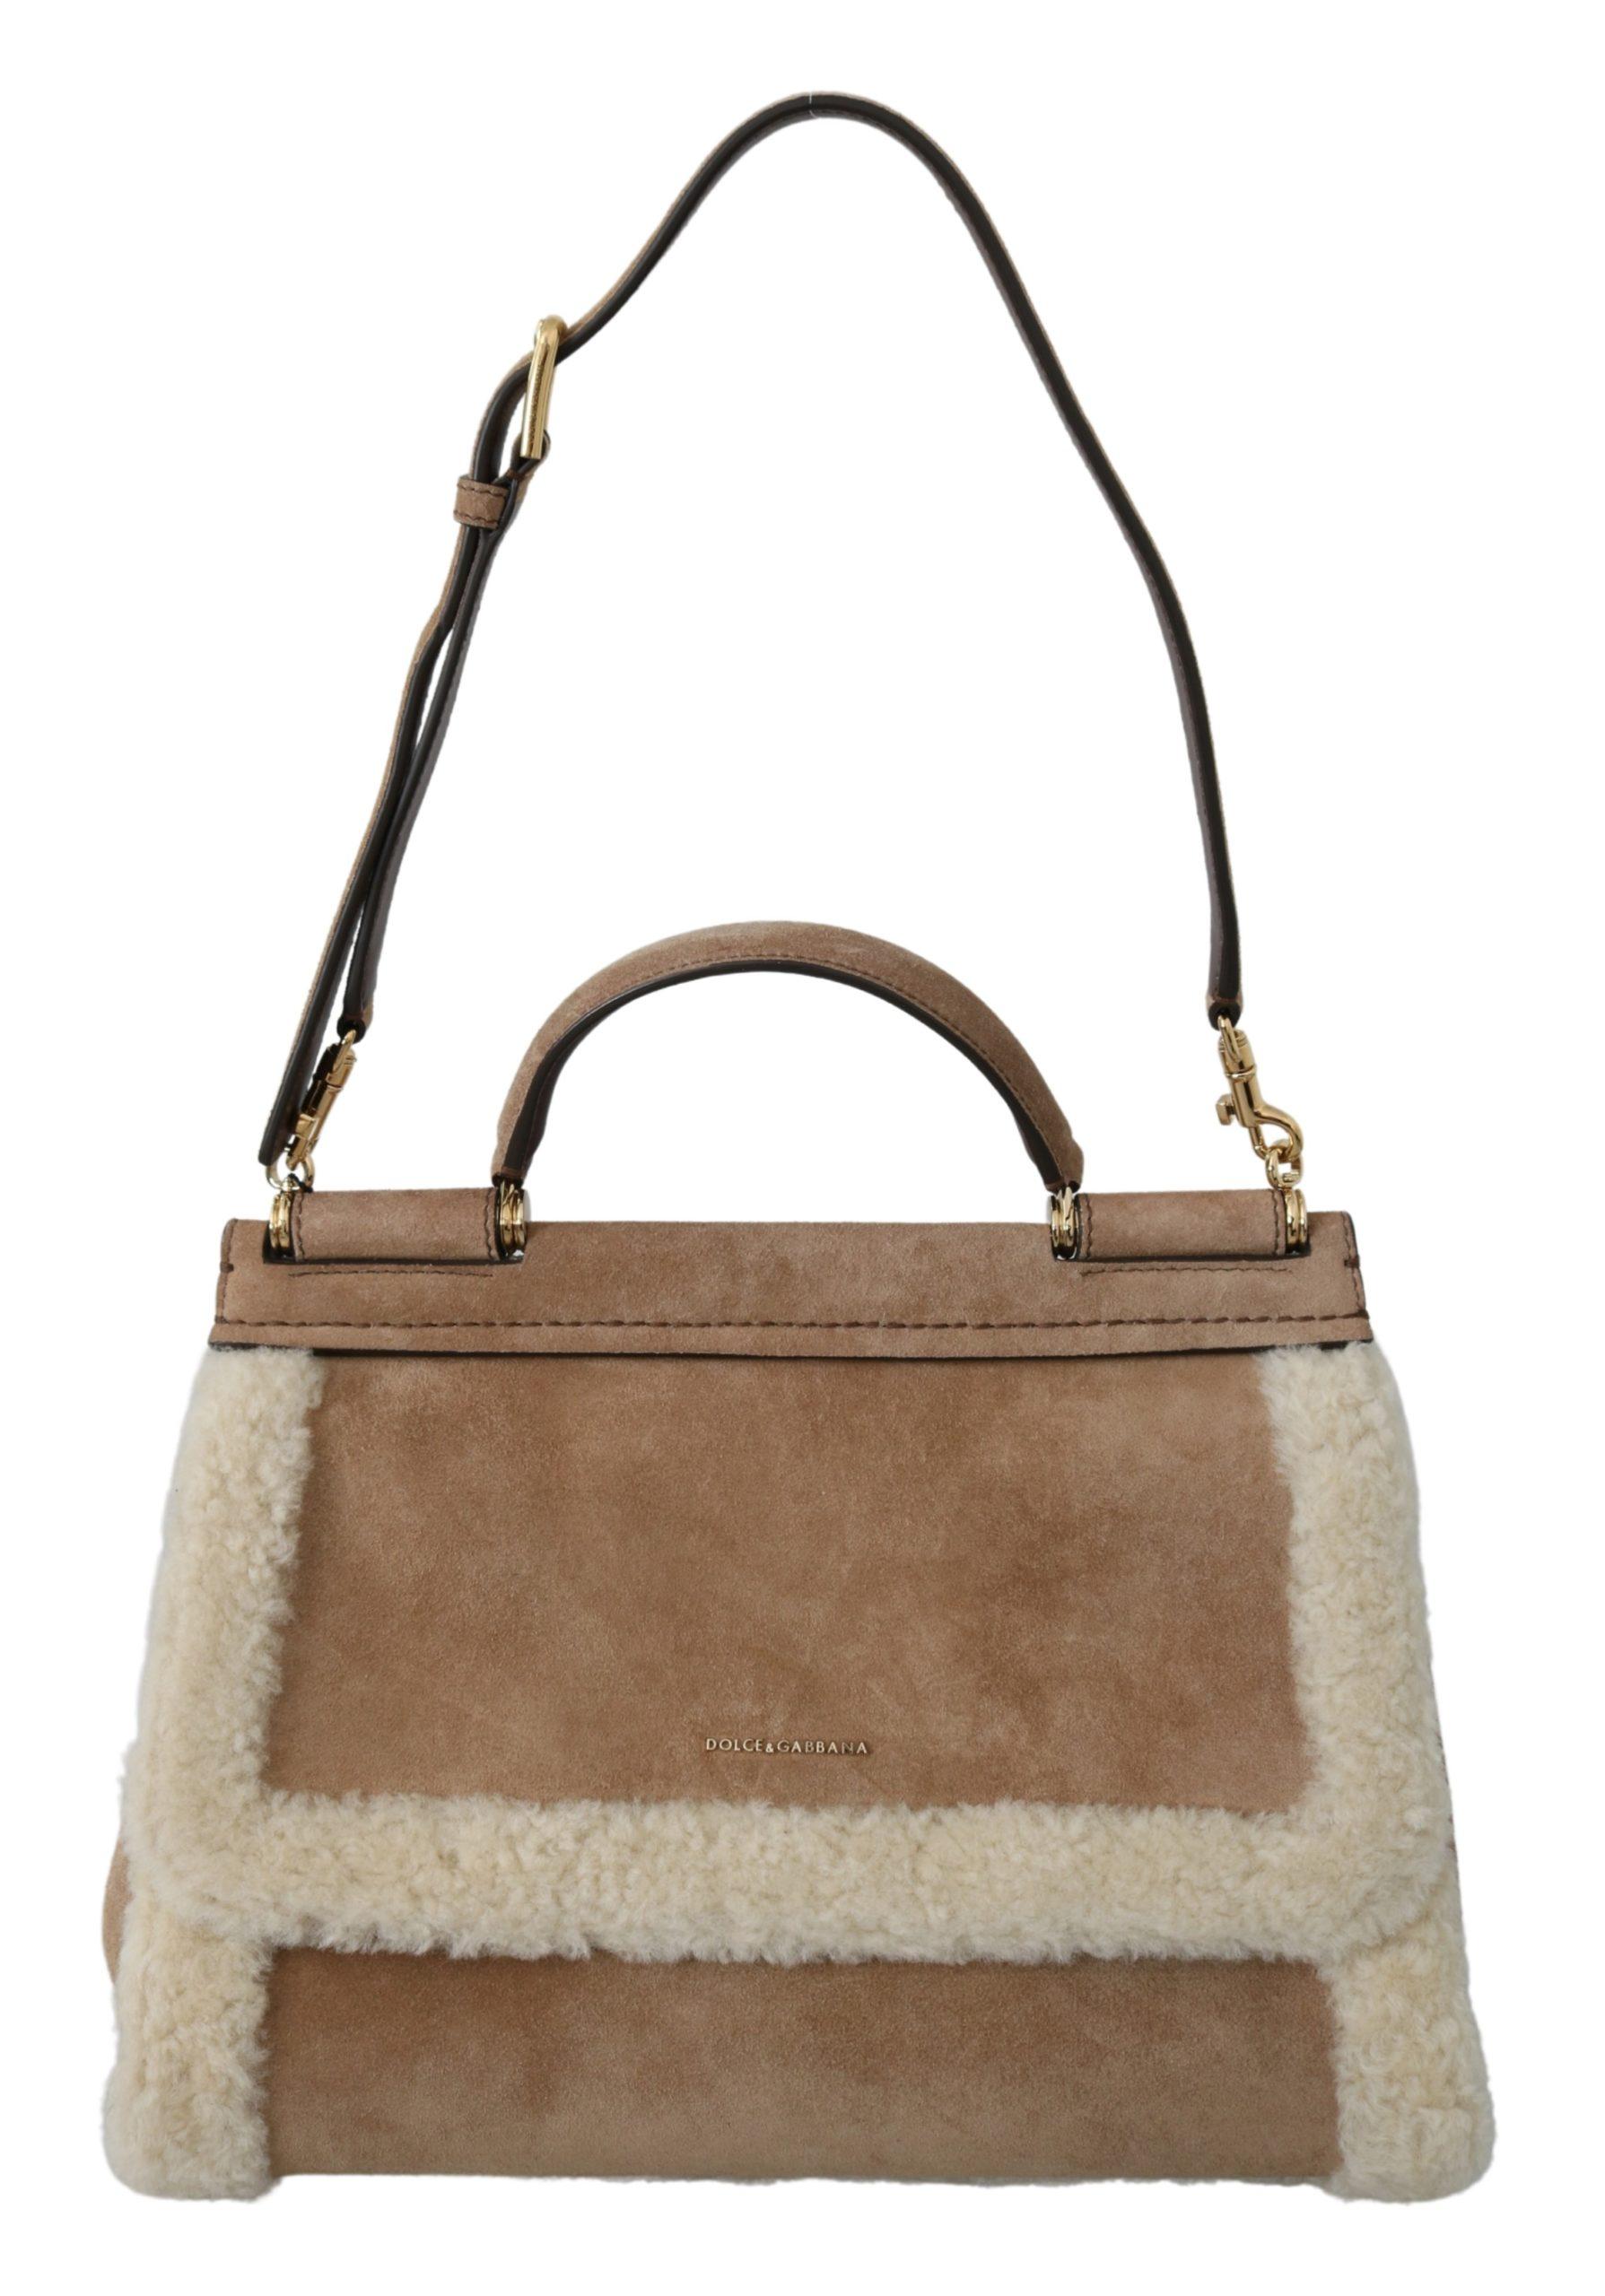 Dolce & Gabbana Women's Suede Shearling Satchel Shoulder Bag Brown VAS9797